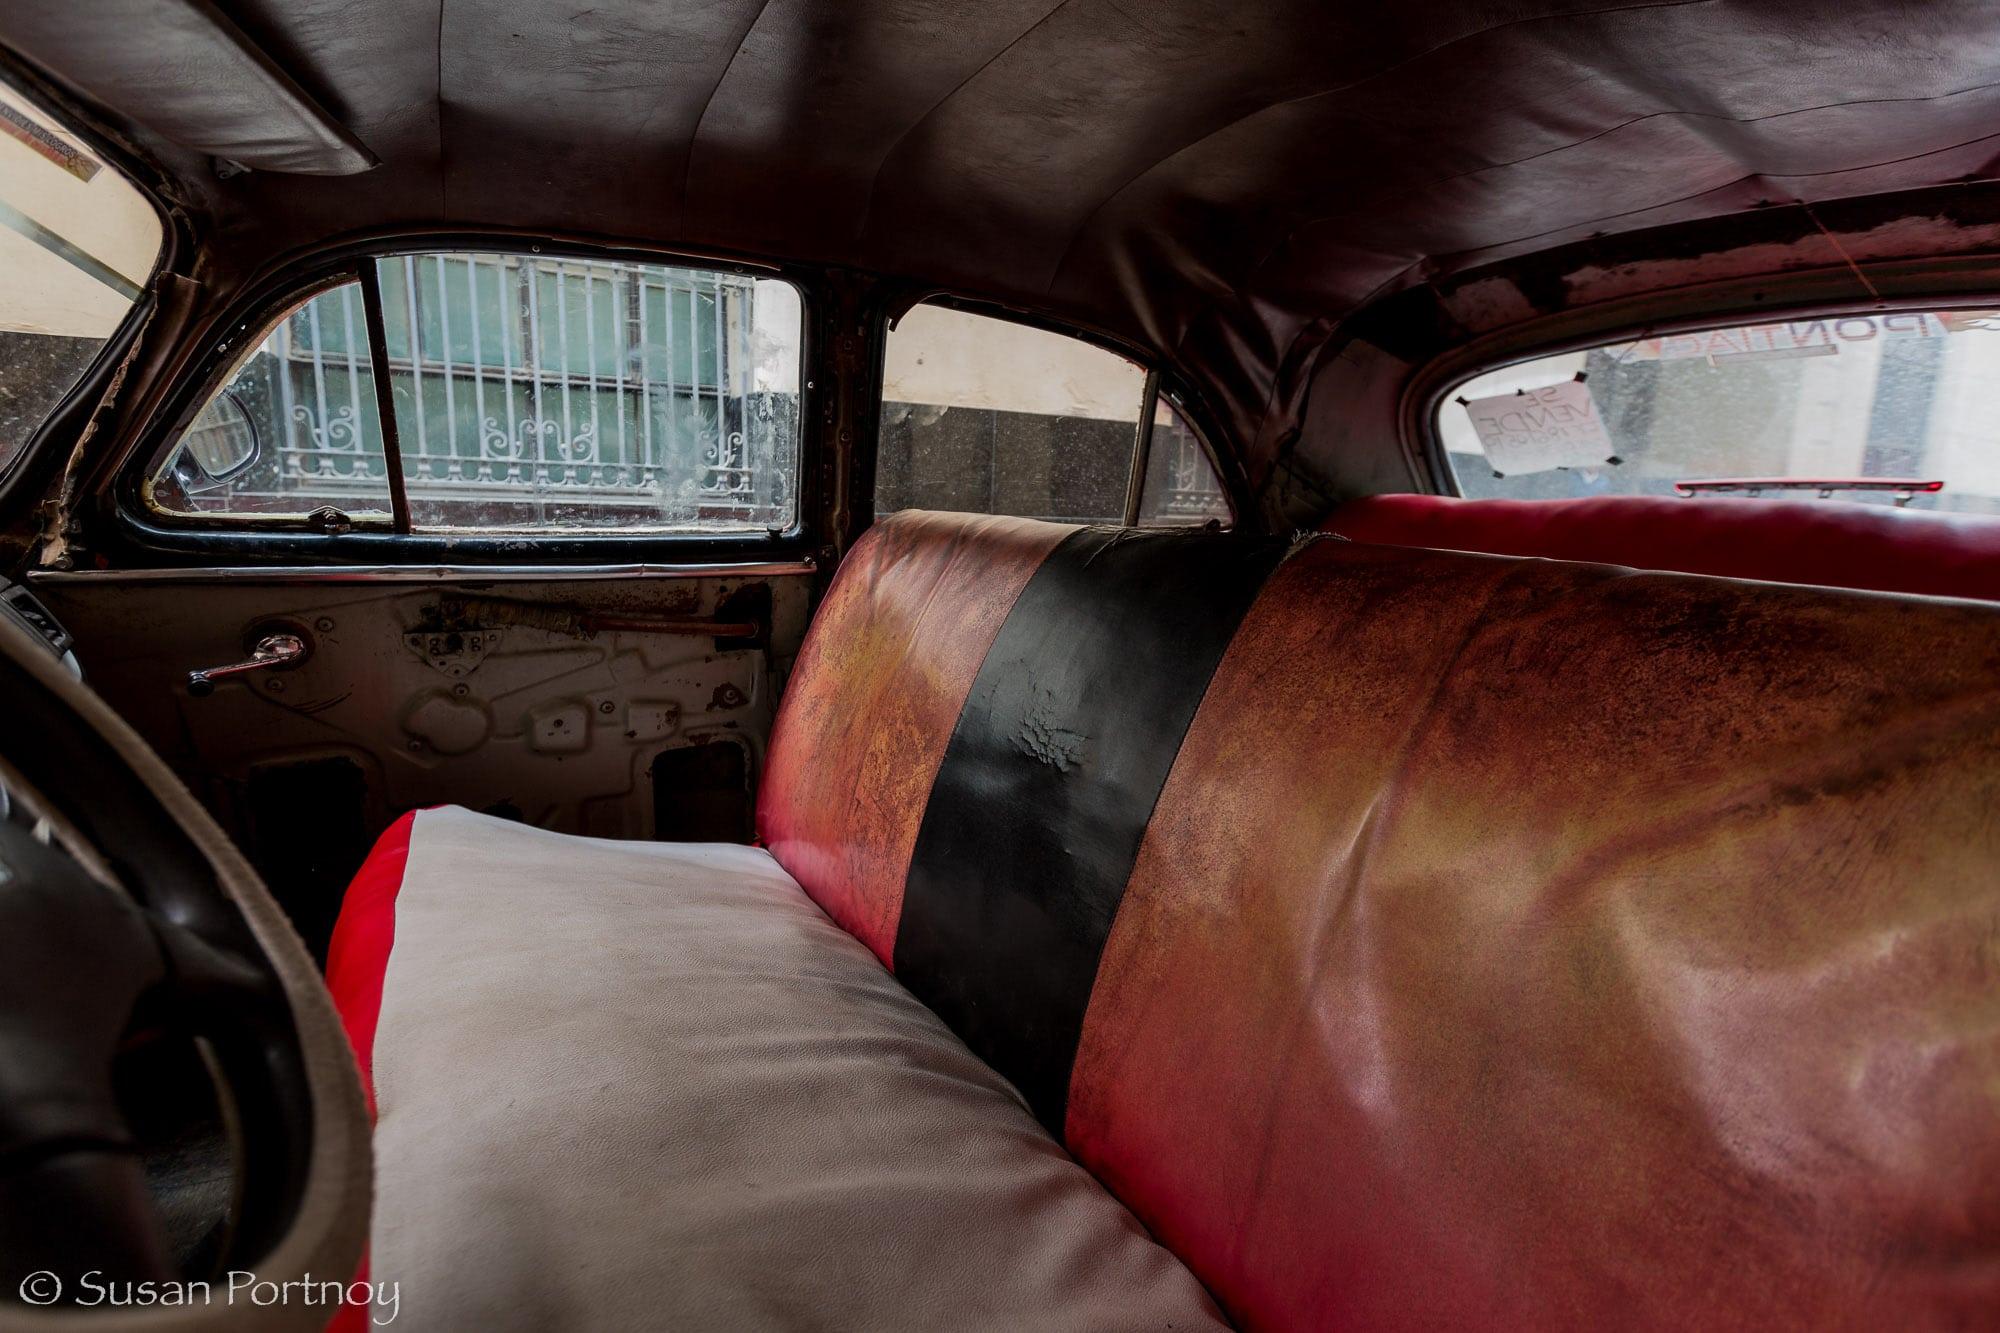 Front seats of red classic car in Havana, Cuba